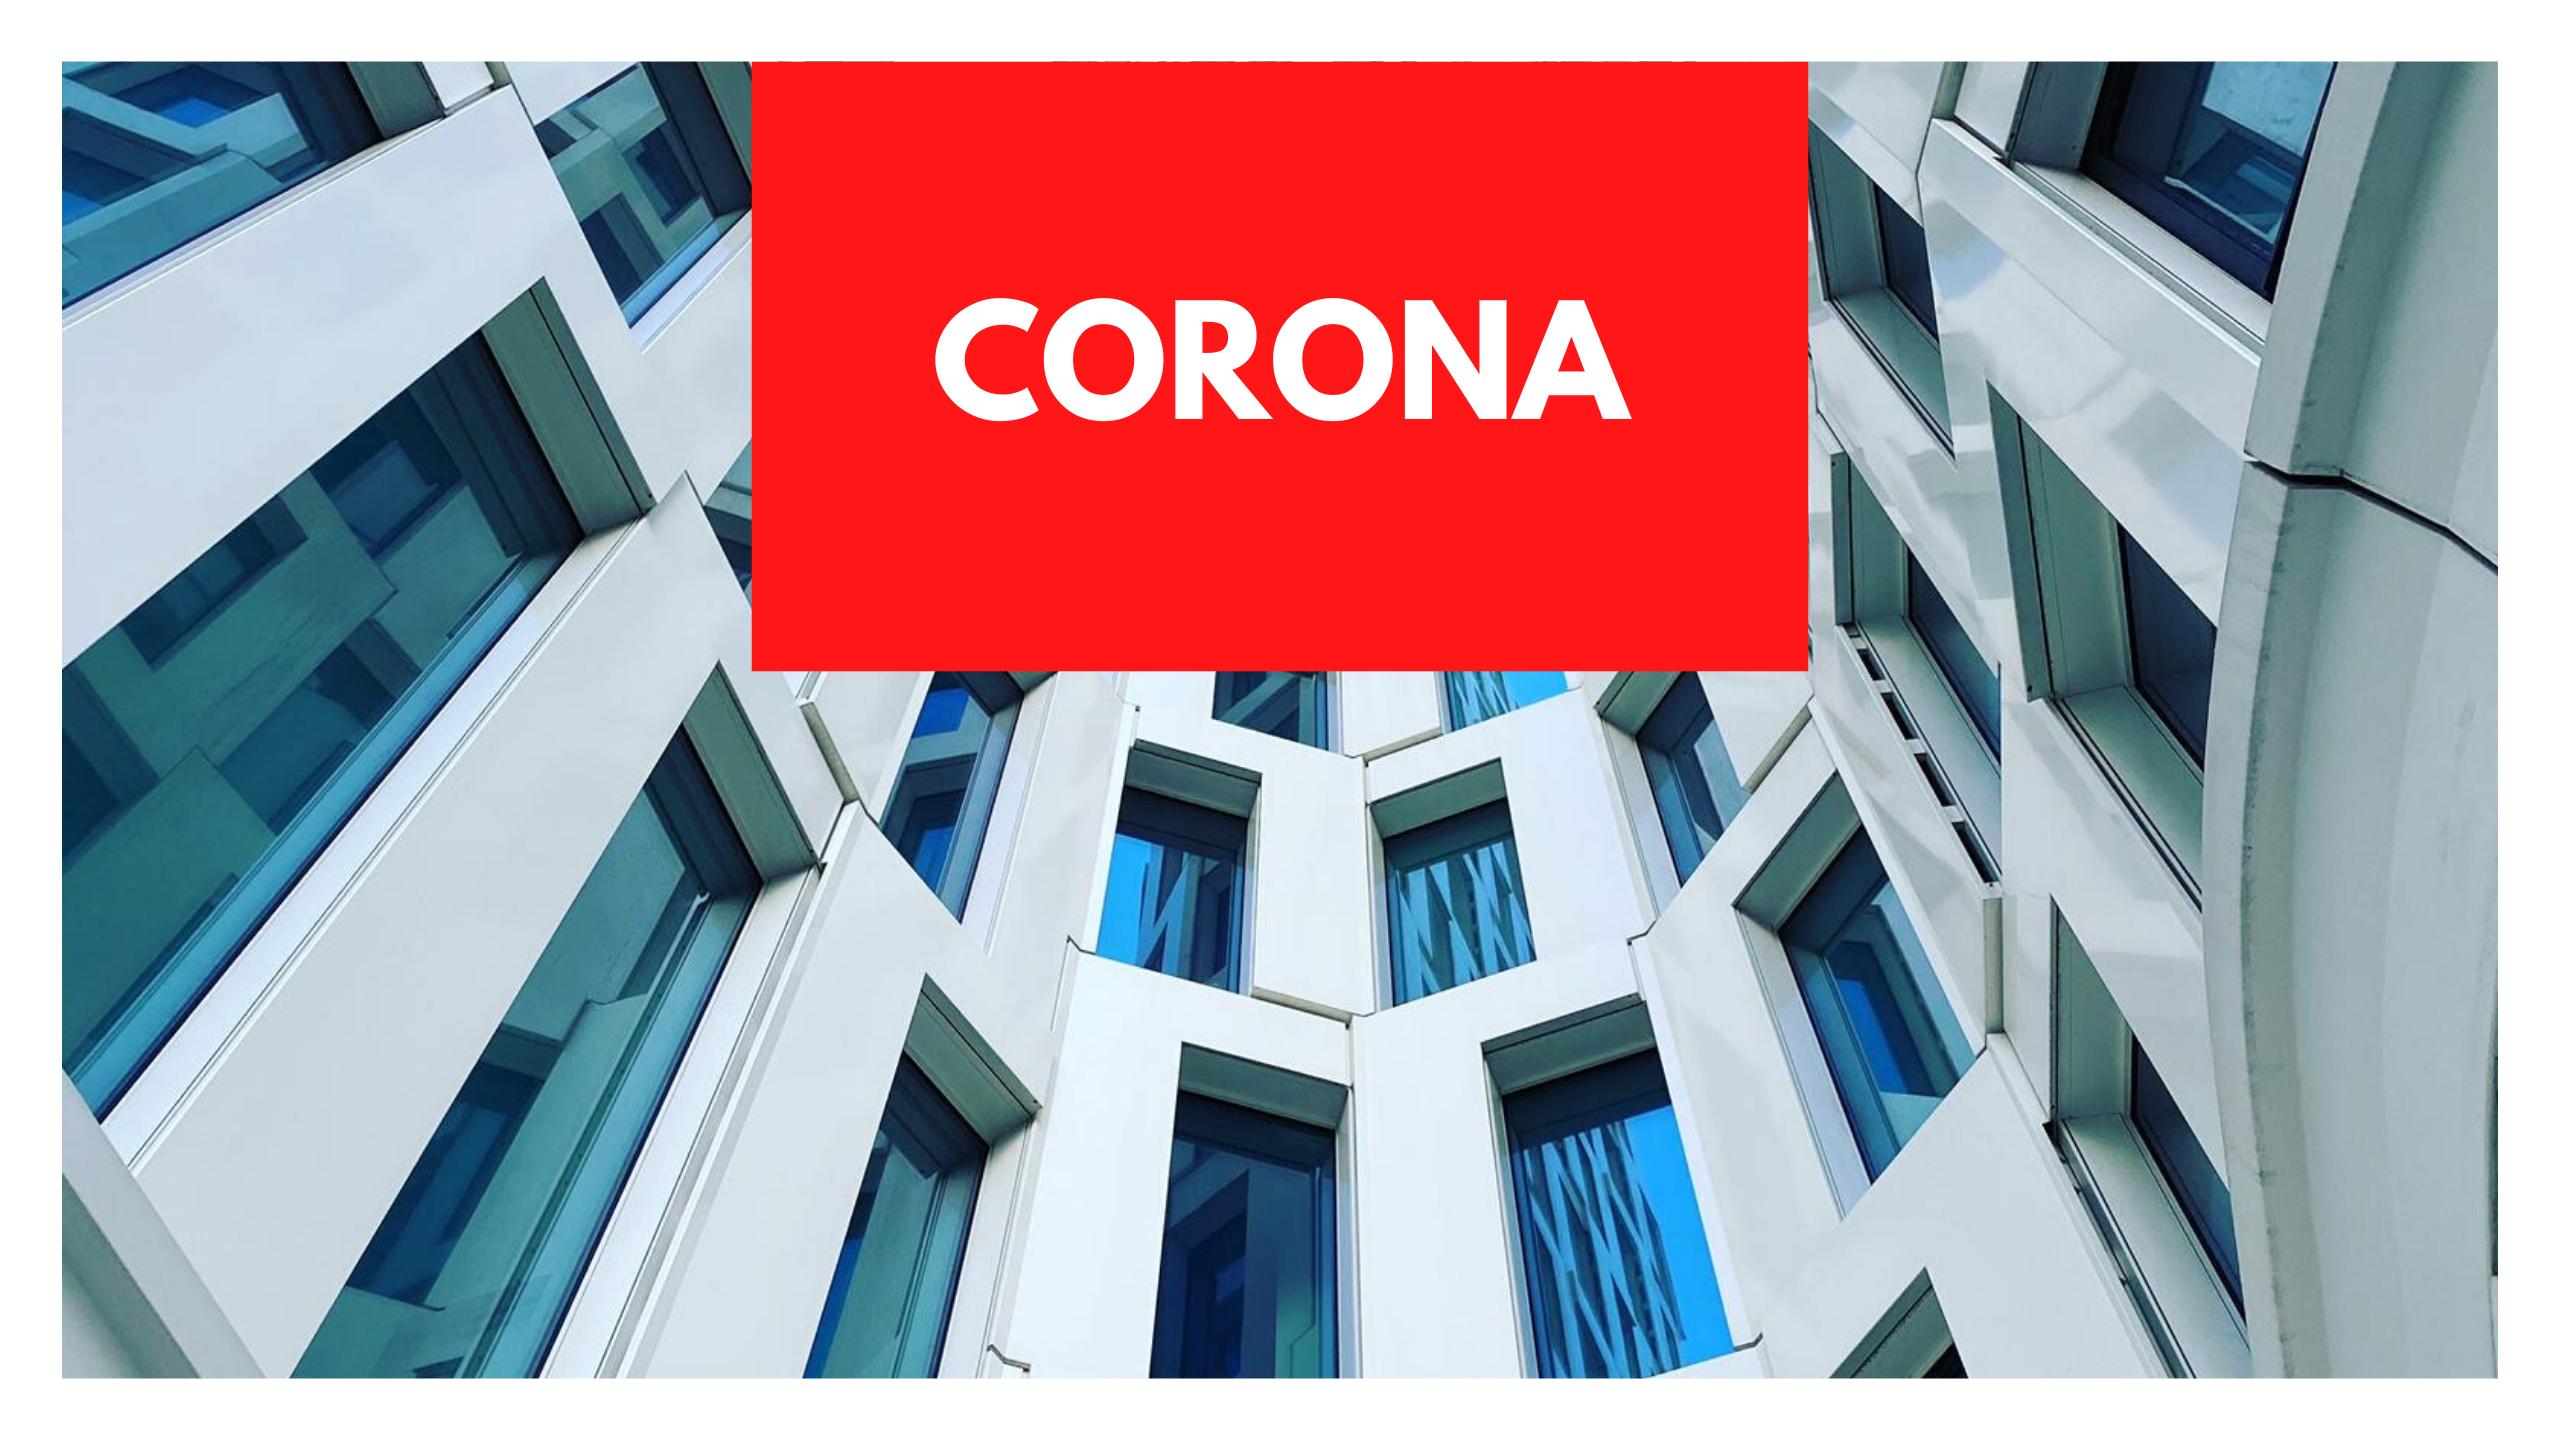 Günstigere KFZ Prämien durch Corona?